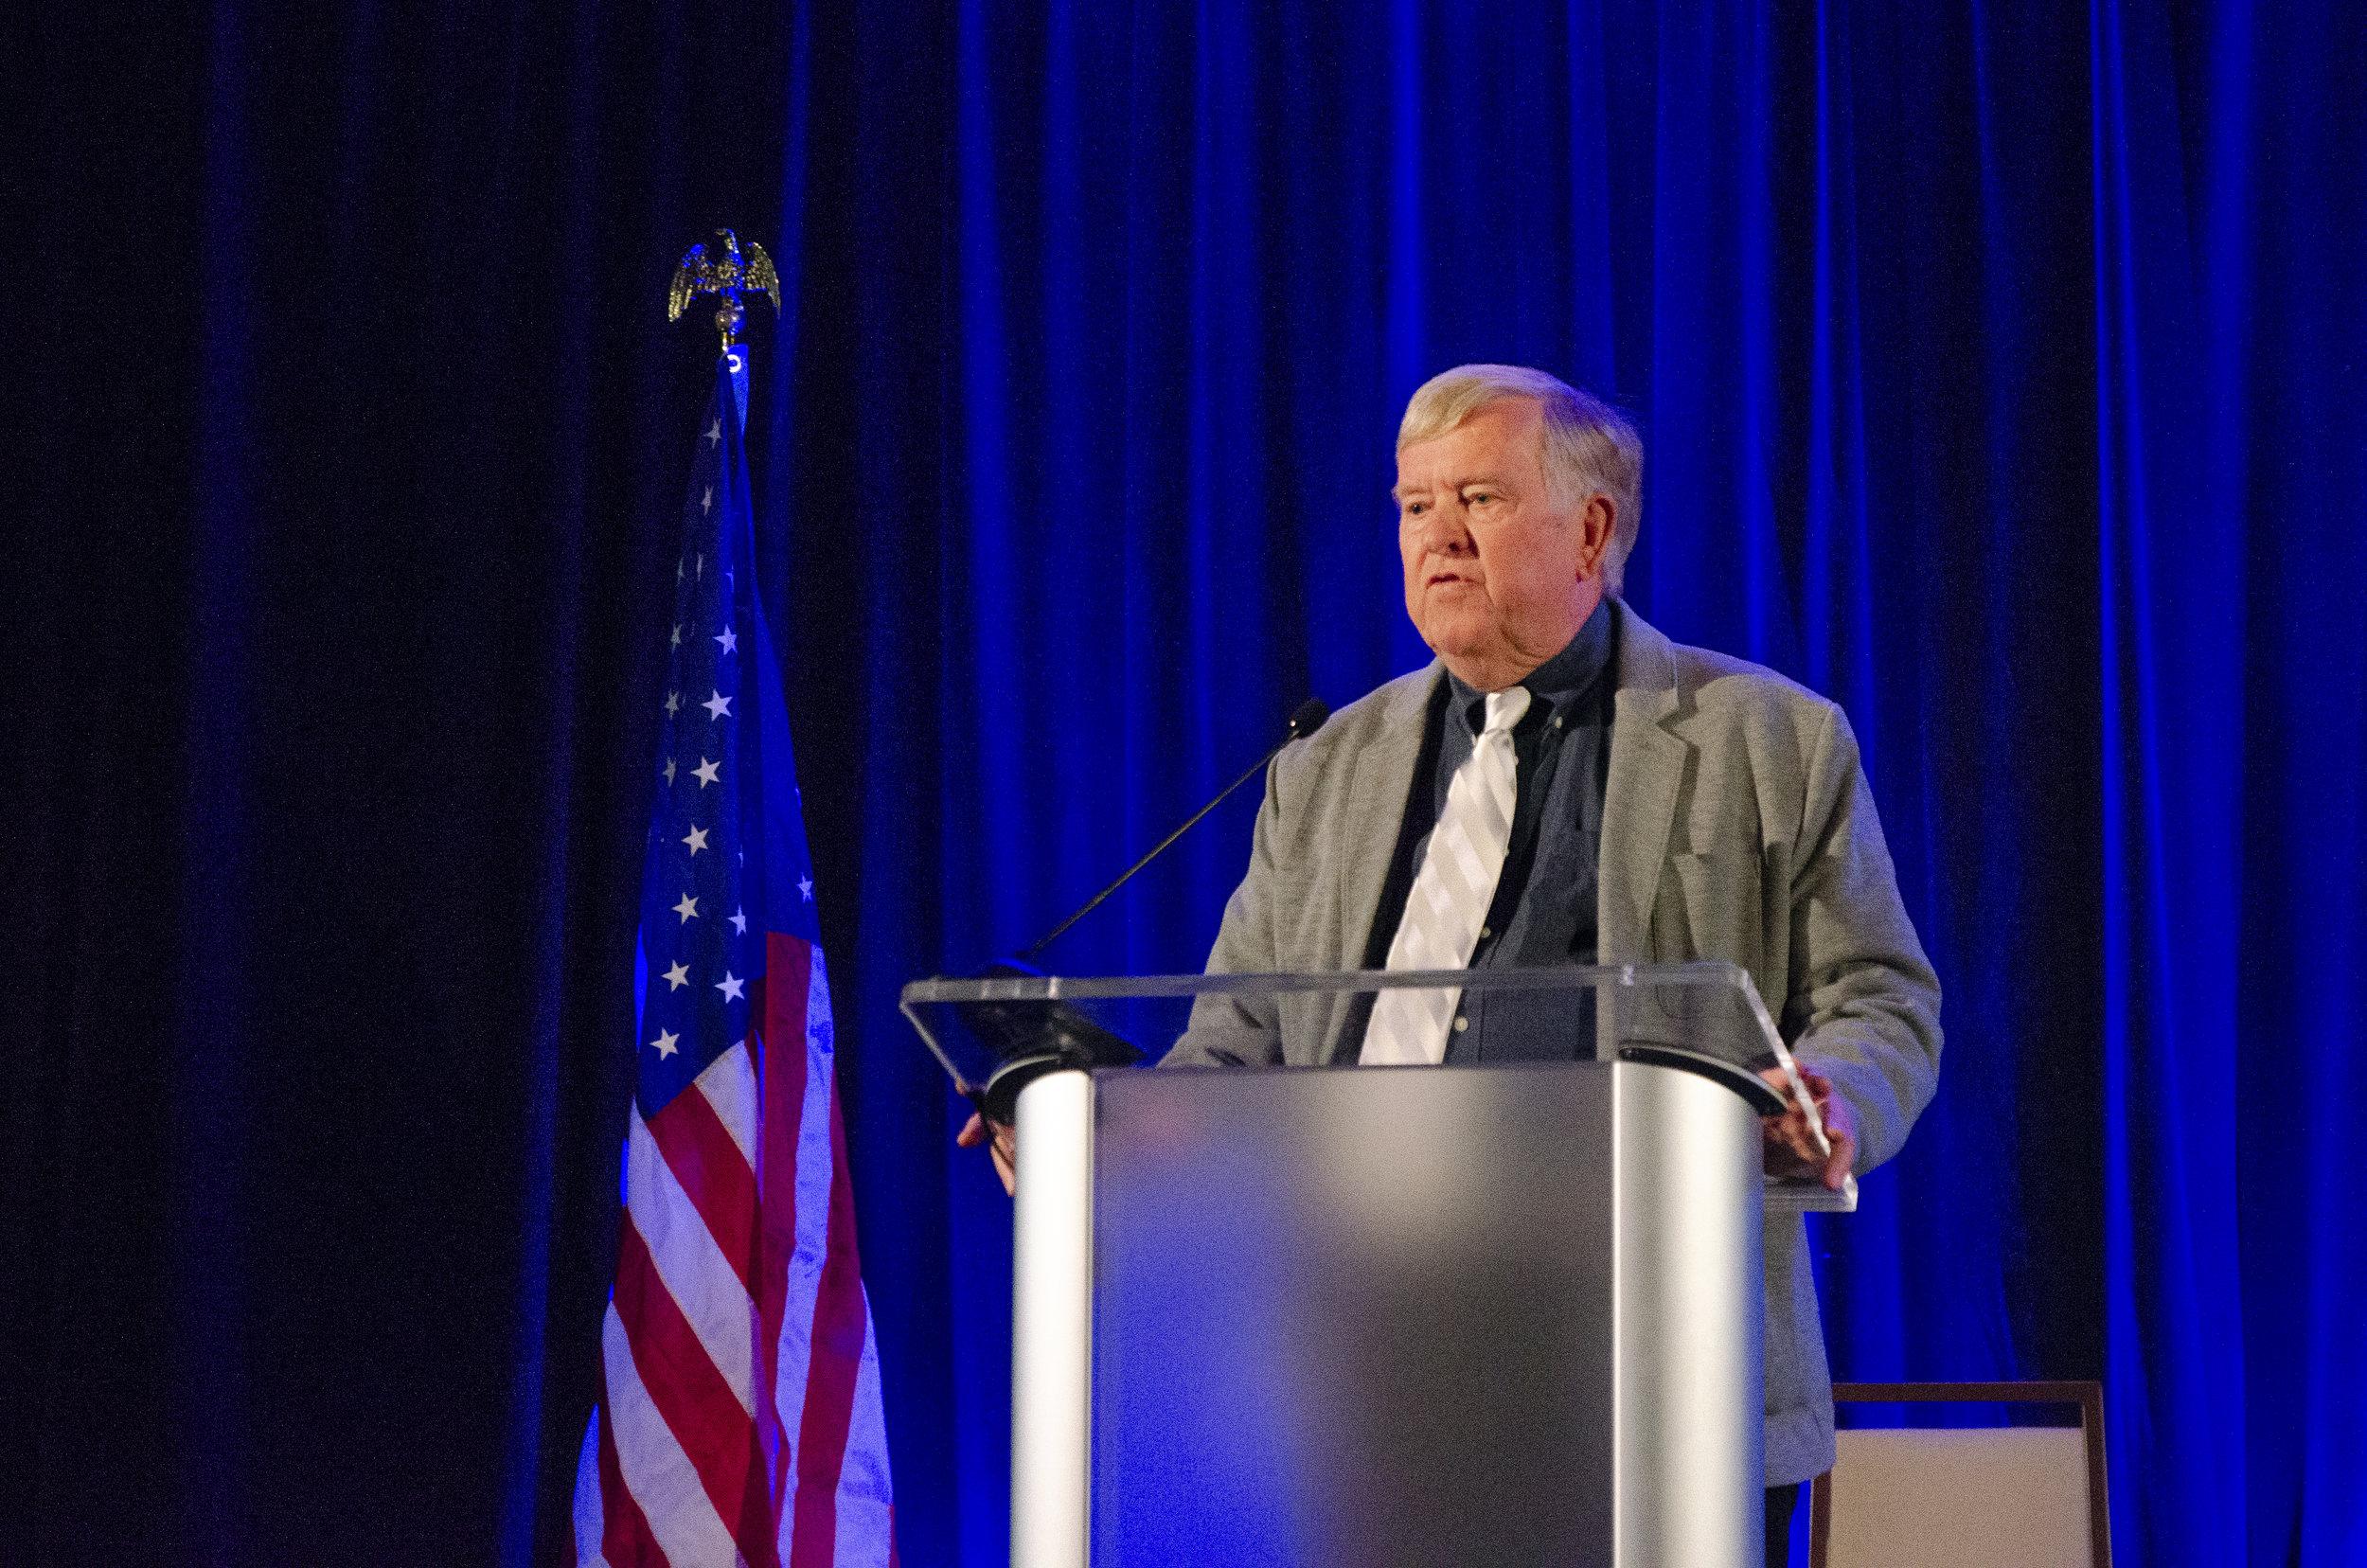 Mayor Ed Honea speaks at the 2019 Marana State of the Town held at the Ritz-Carlton, Dove Mountain.